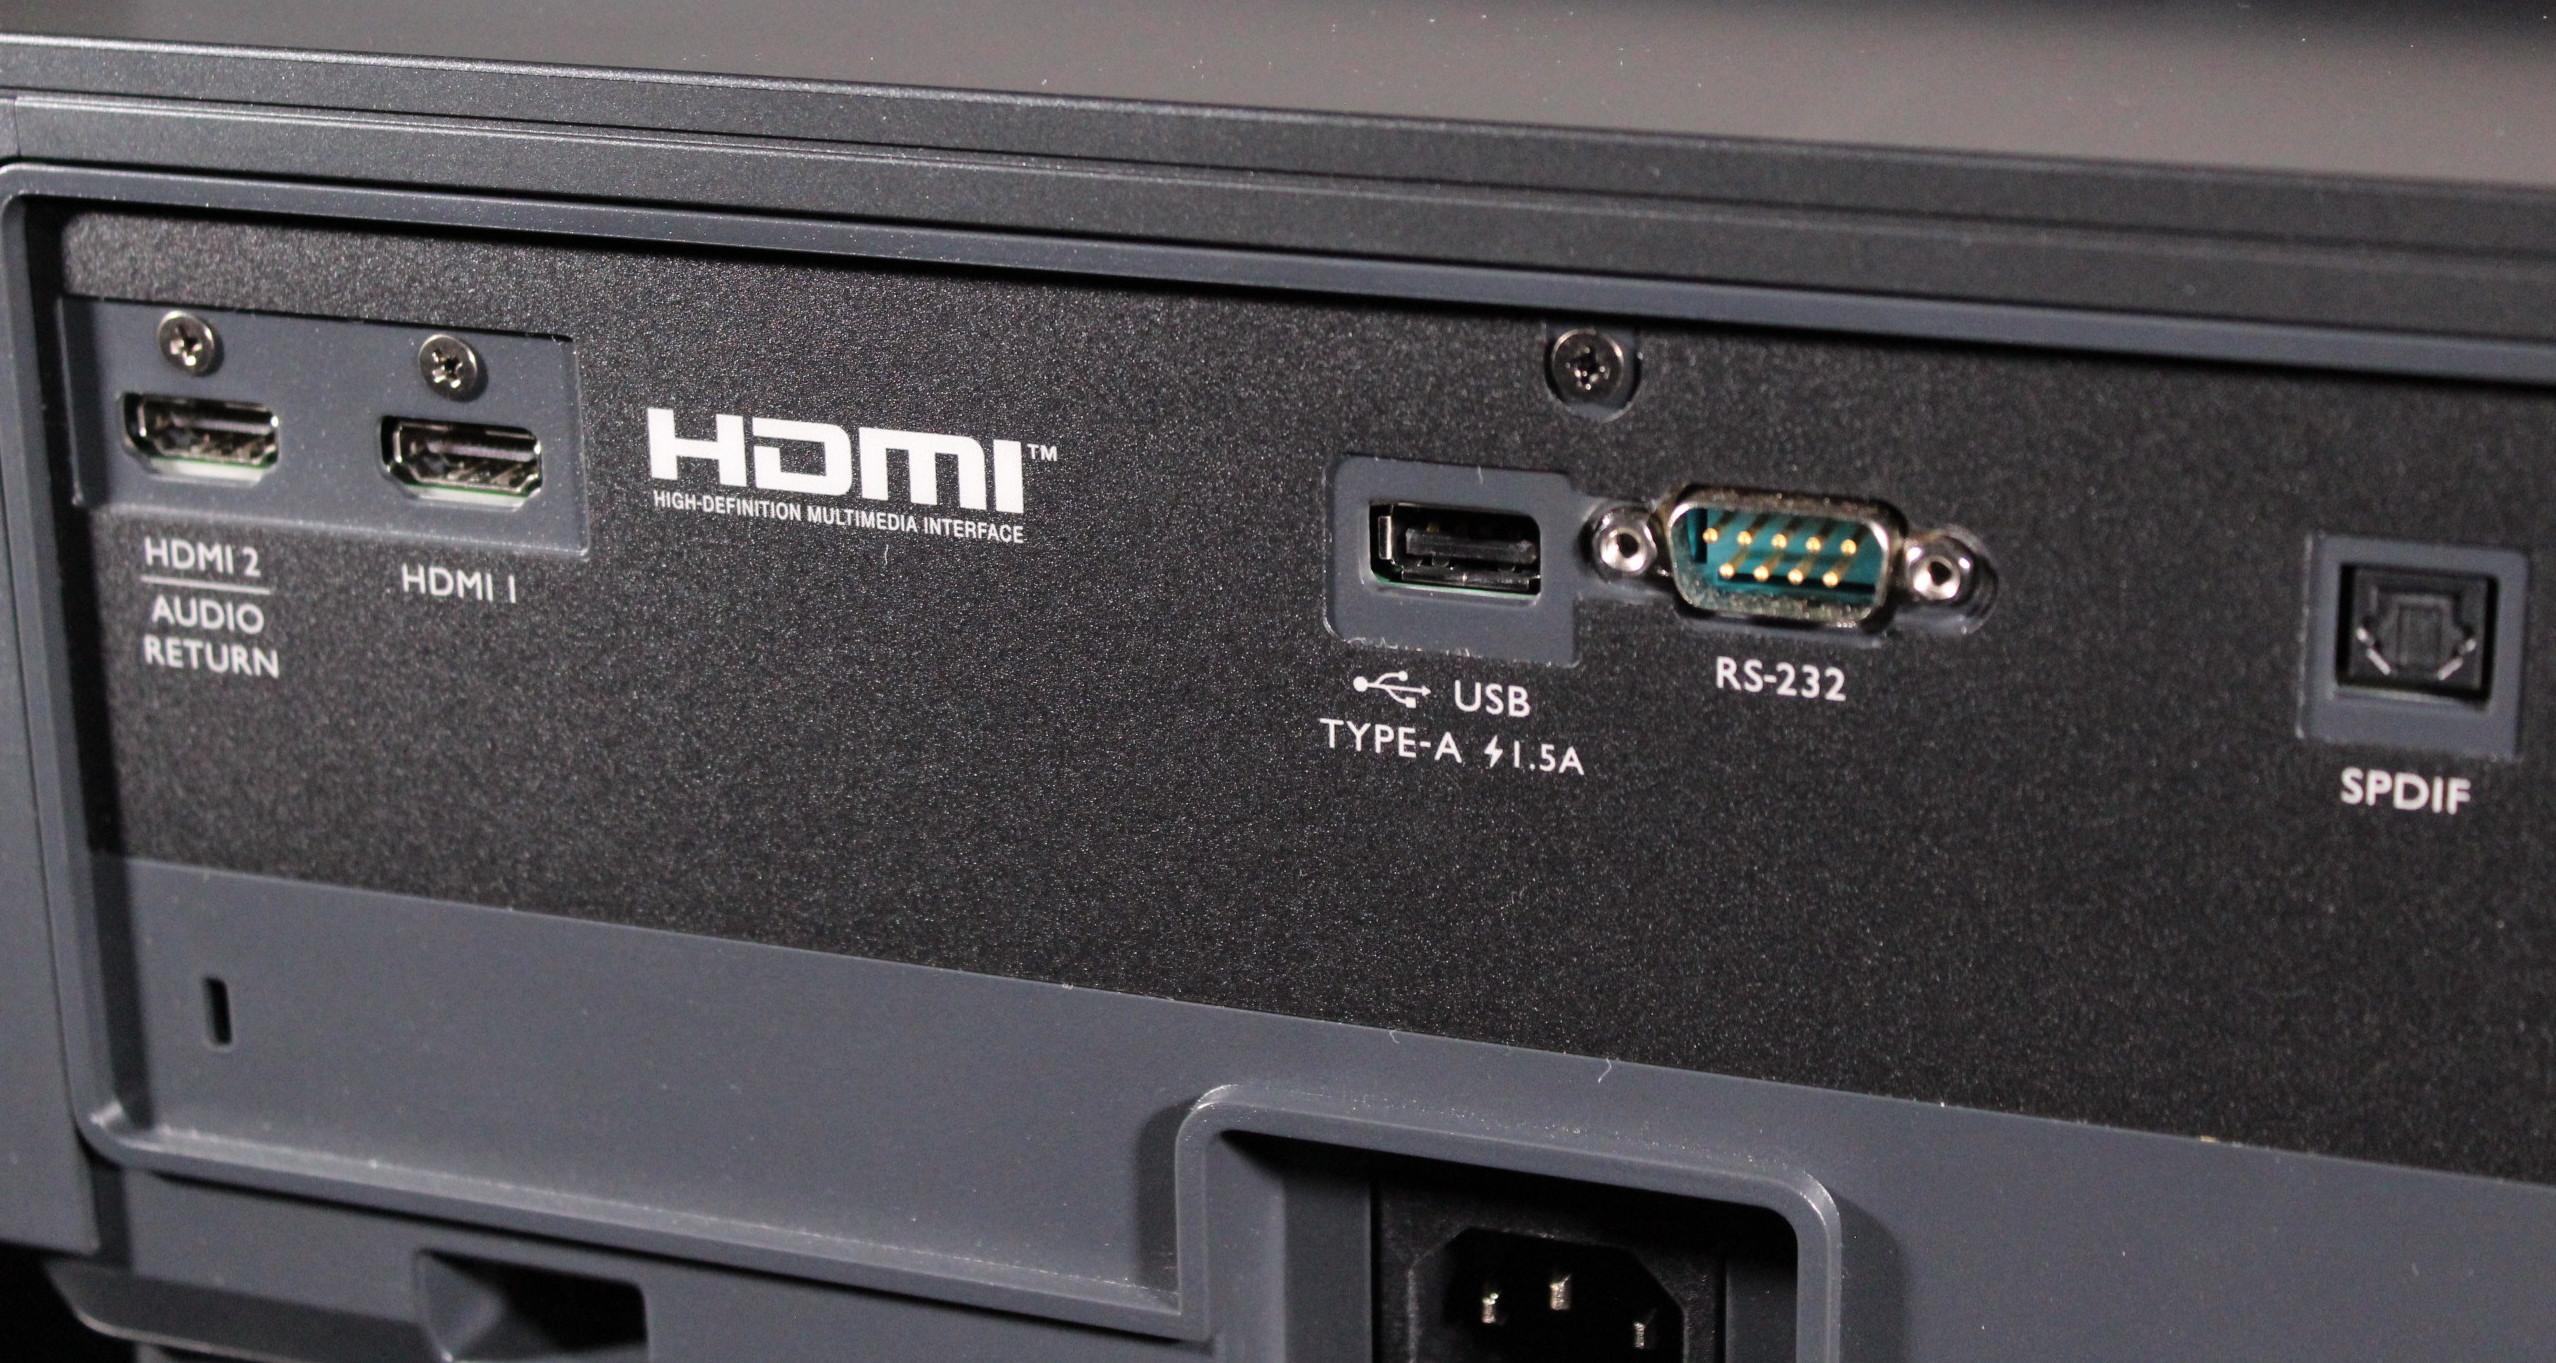 BenQ V6050 UST projector